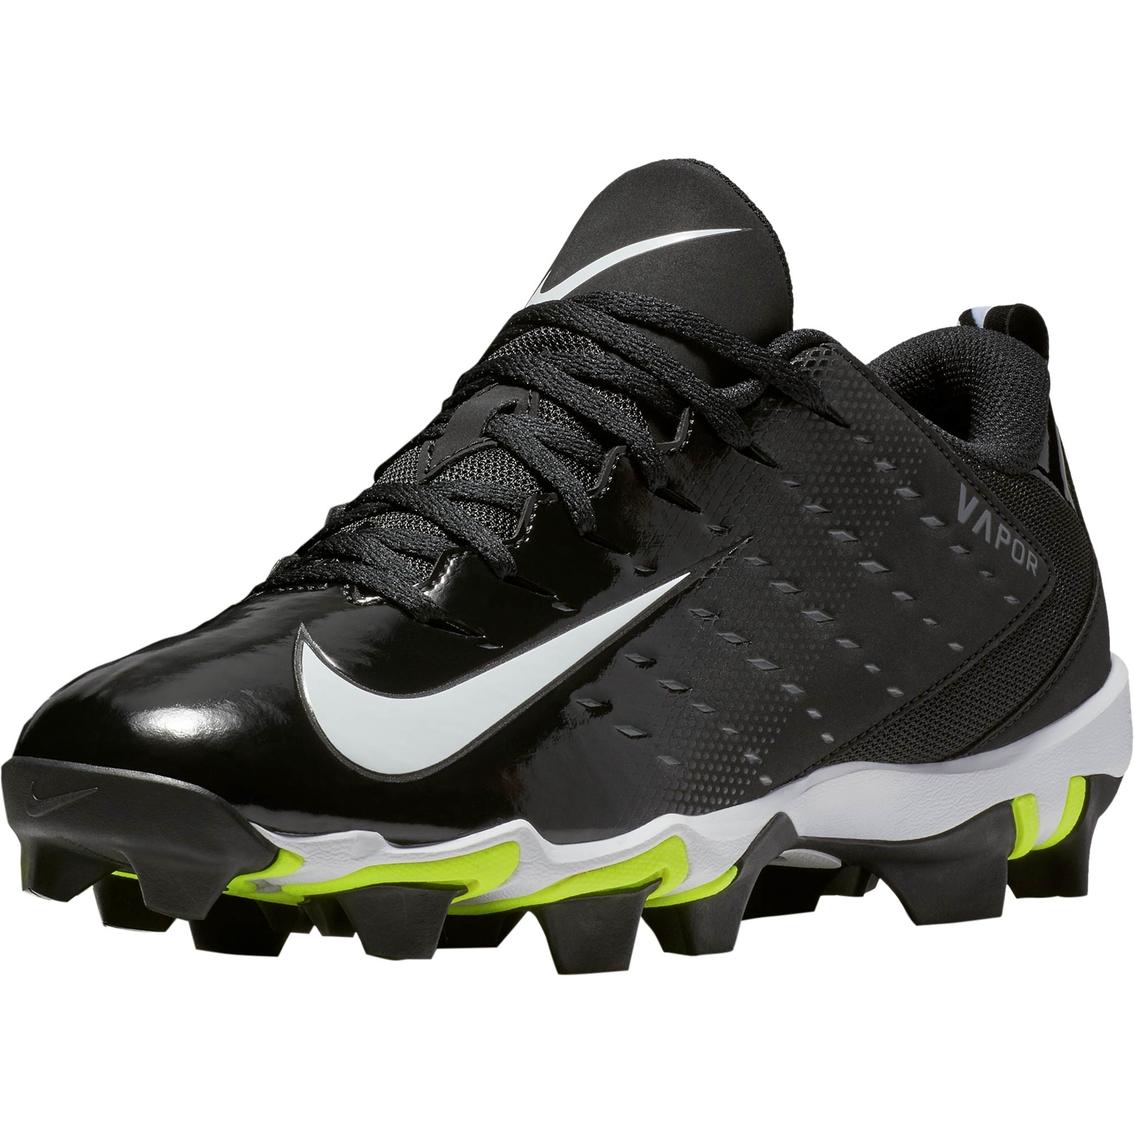 best sneakers 35ec7 7b8e5 Nike Men s Vapor Untouchable Shark 3 Football Cleats